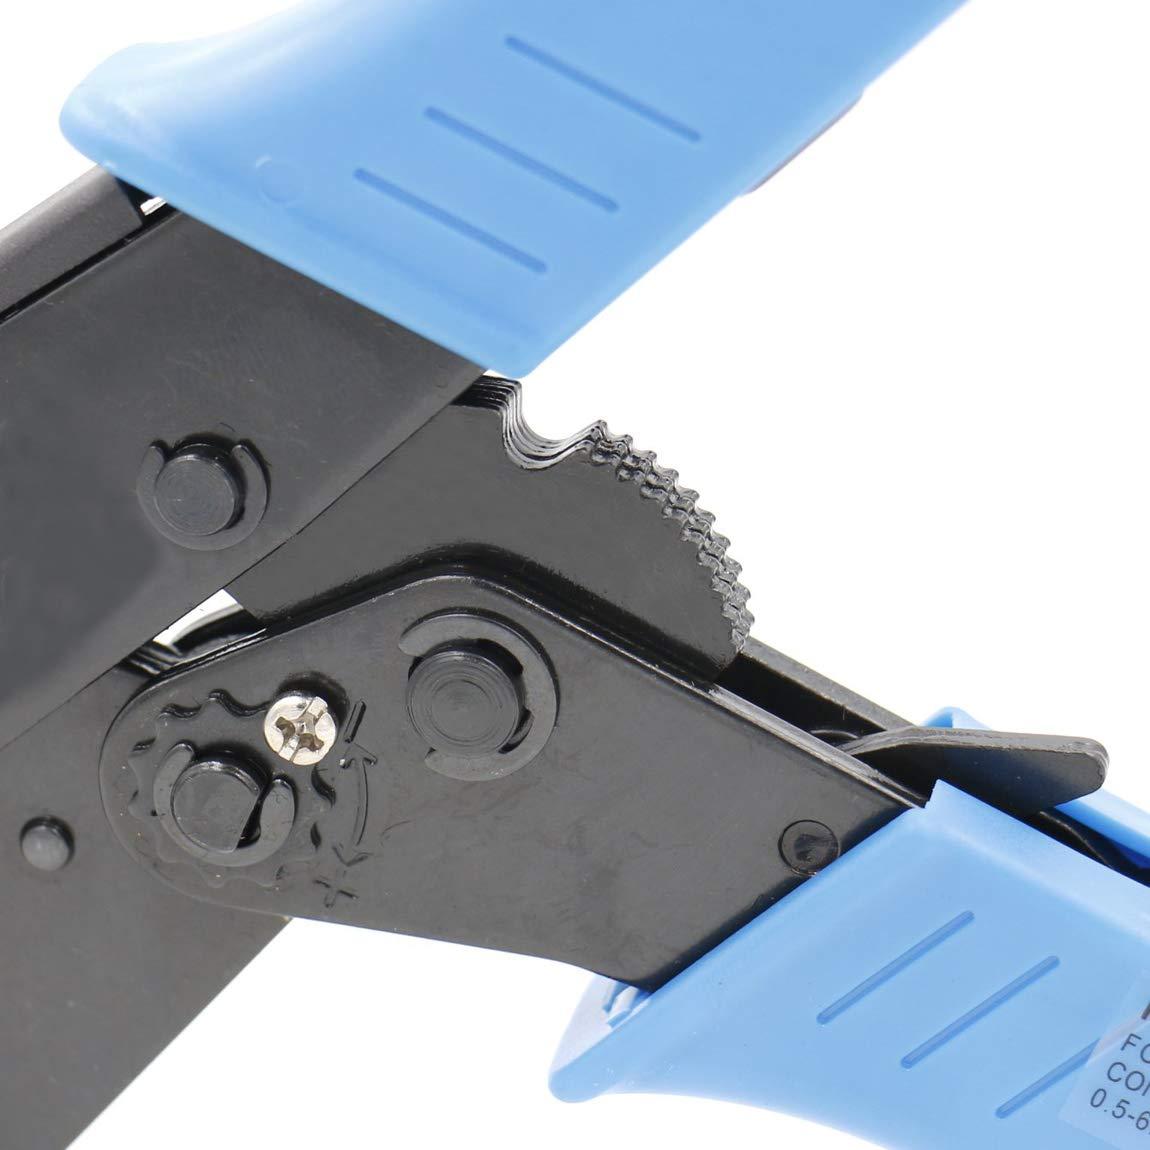 Bleu Heschen /à cliquet Pince /à sertir Pince Hs-30j c/âble isol/é Bornes /à sertir outils /à utiliser pour 1 2,5 20/–10/AWG 6/mm/²